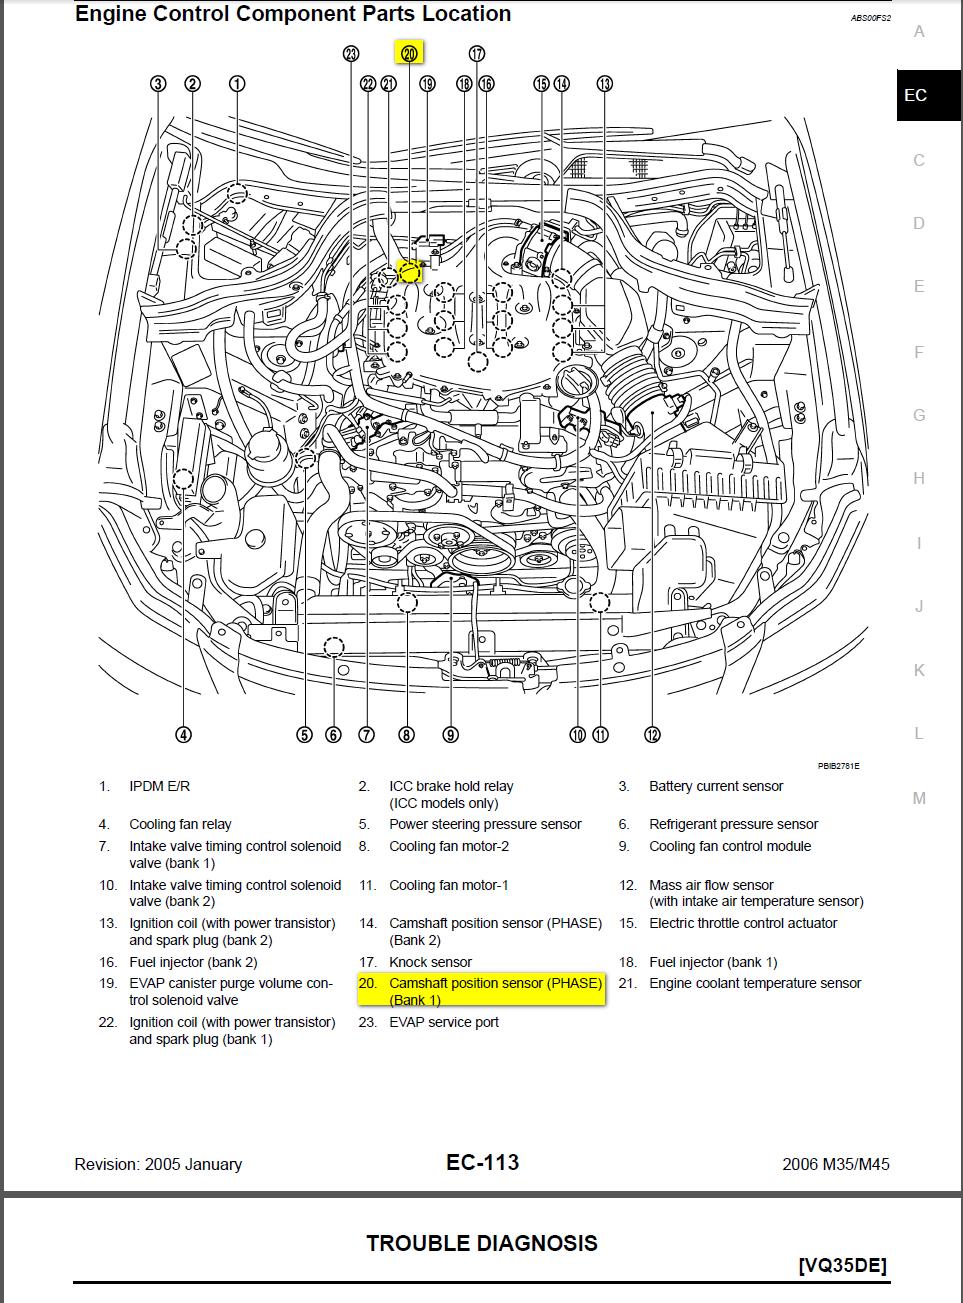 2005 Infiniti G35 Engine Diagram Wiring Diagram Skip Browse Skip Browse Bowlingronta It